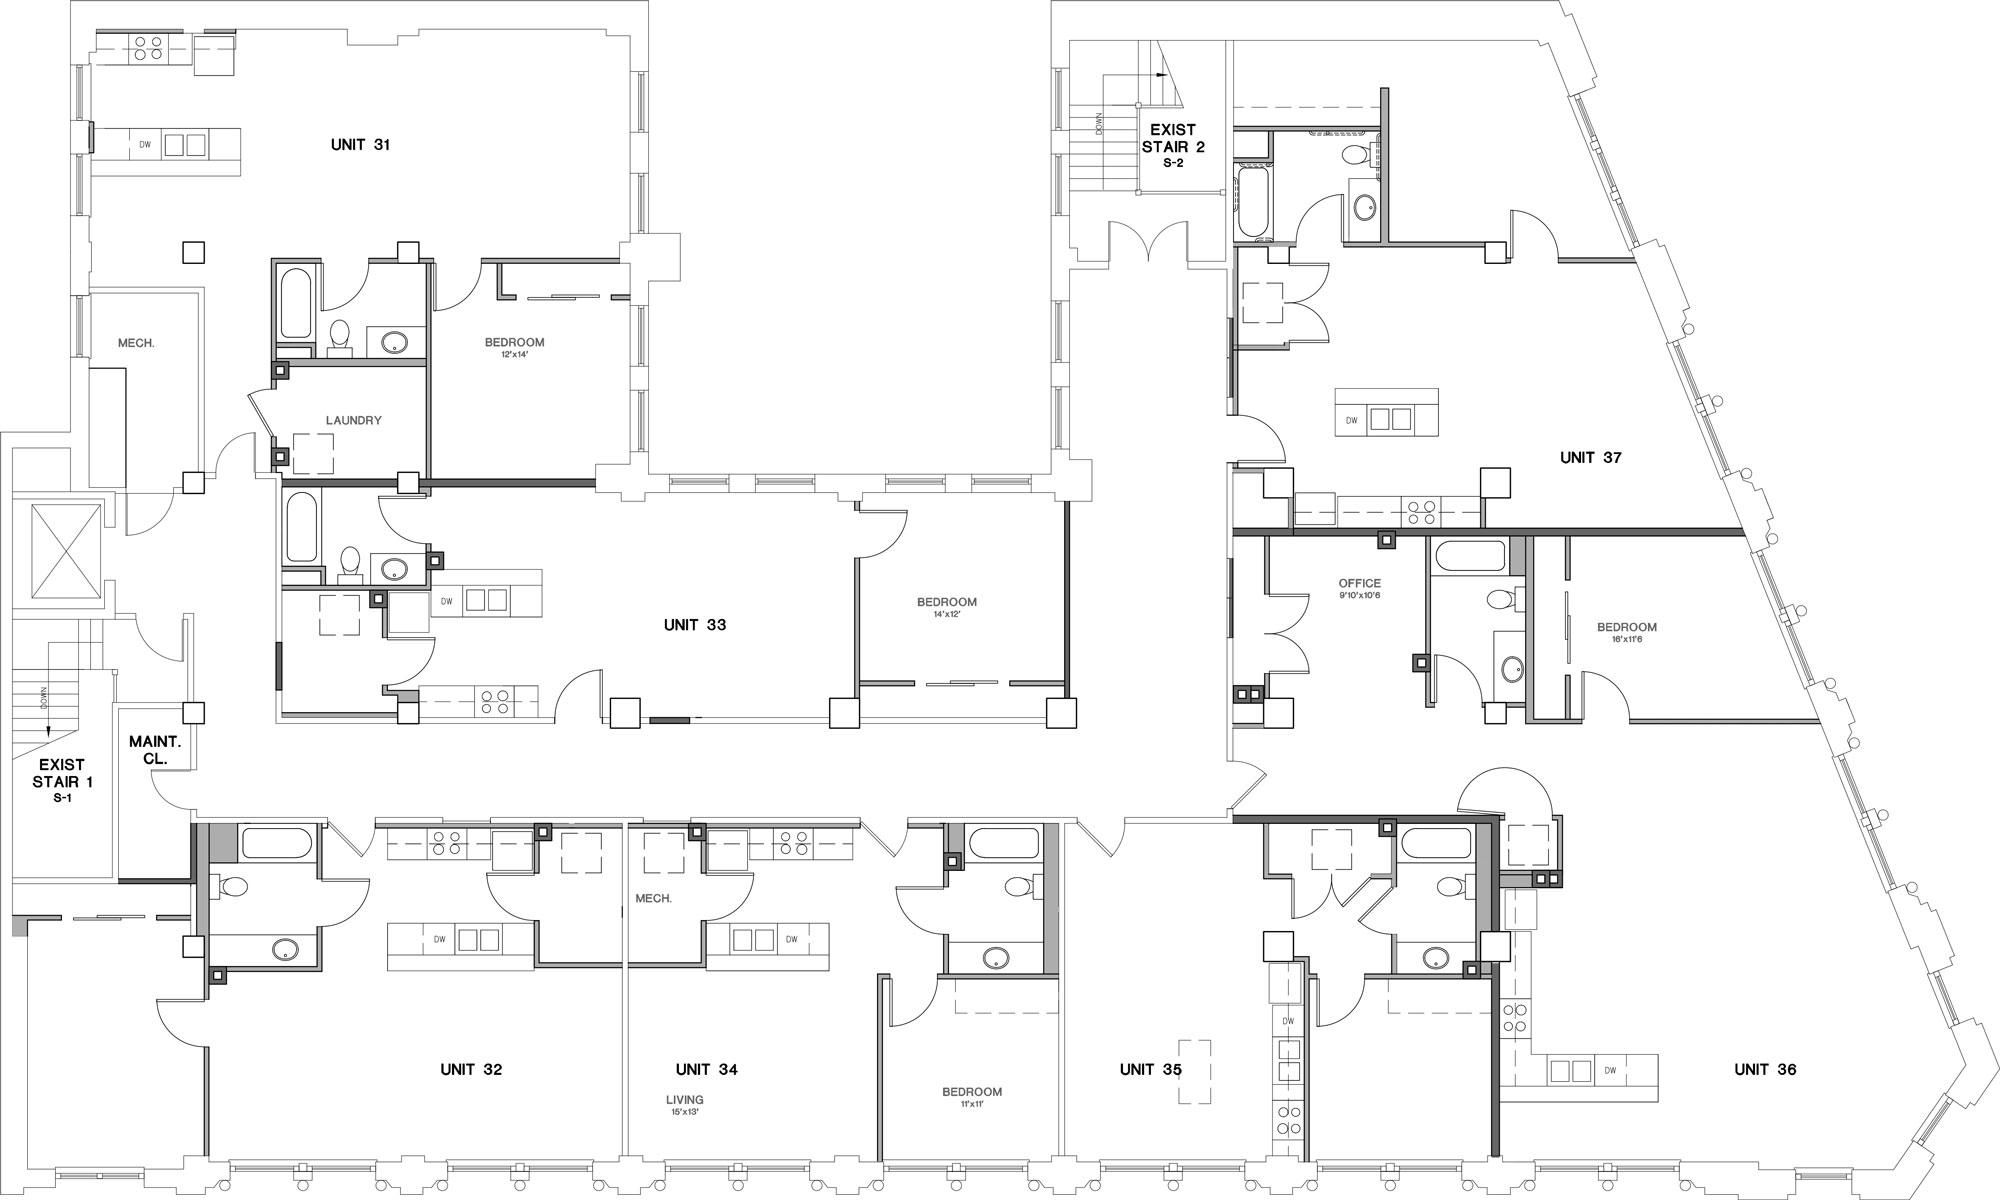 Mutual Building Third Floor Plan